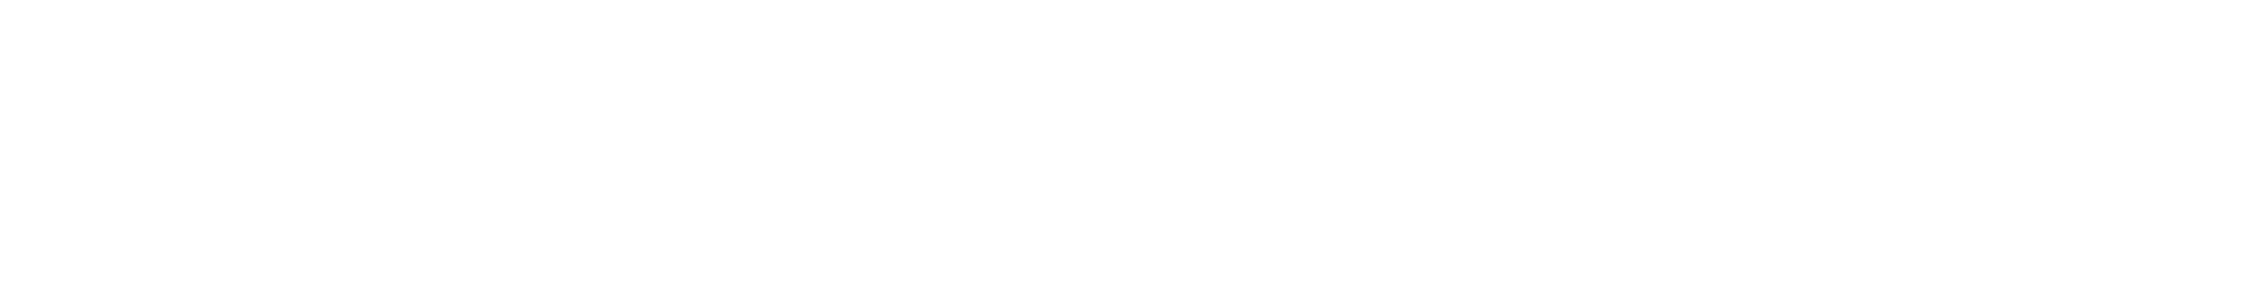 Inspired Fire Glass Studio & Gallery Logo